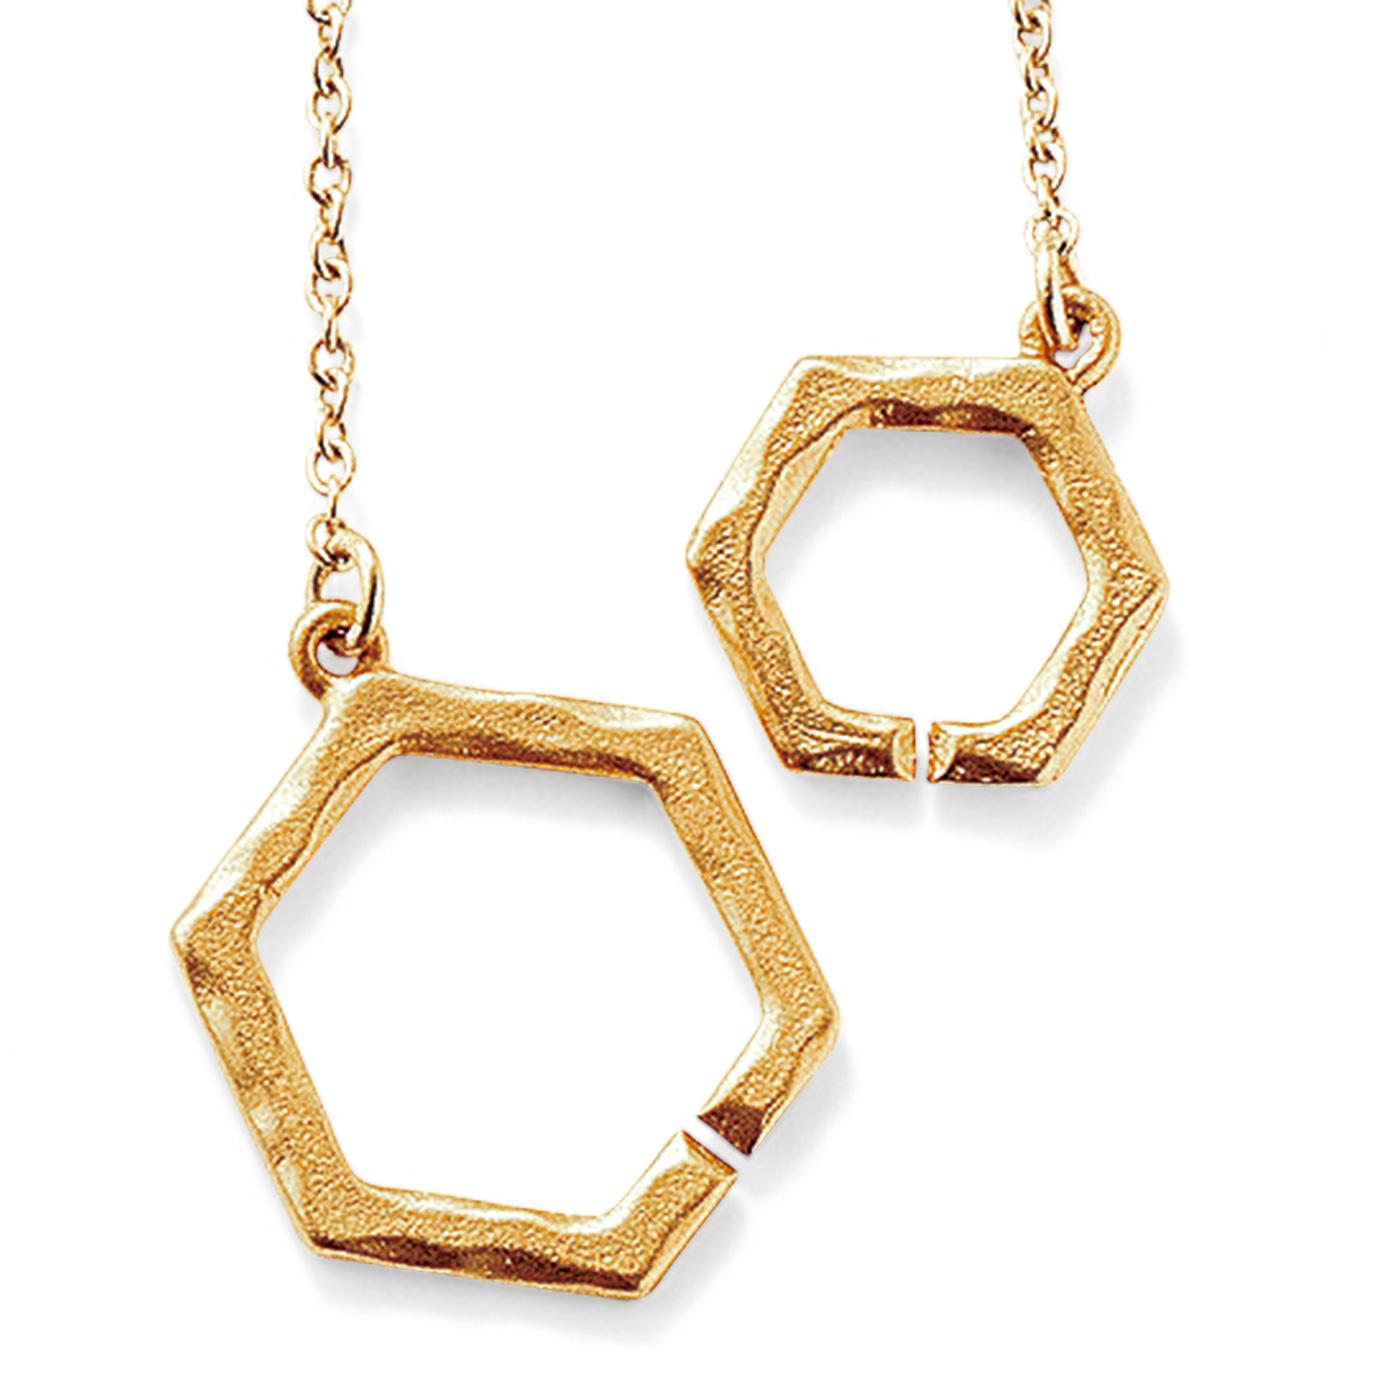 hexagon モチーフ同士を知恵の輪のようにつなぐ留め具です。